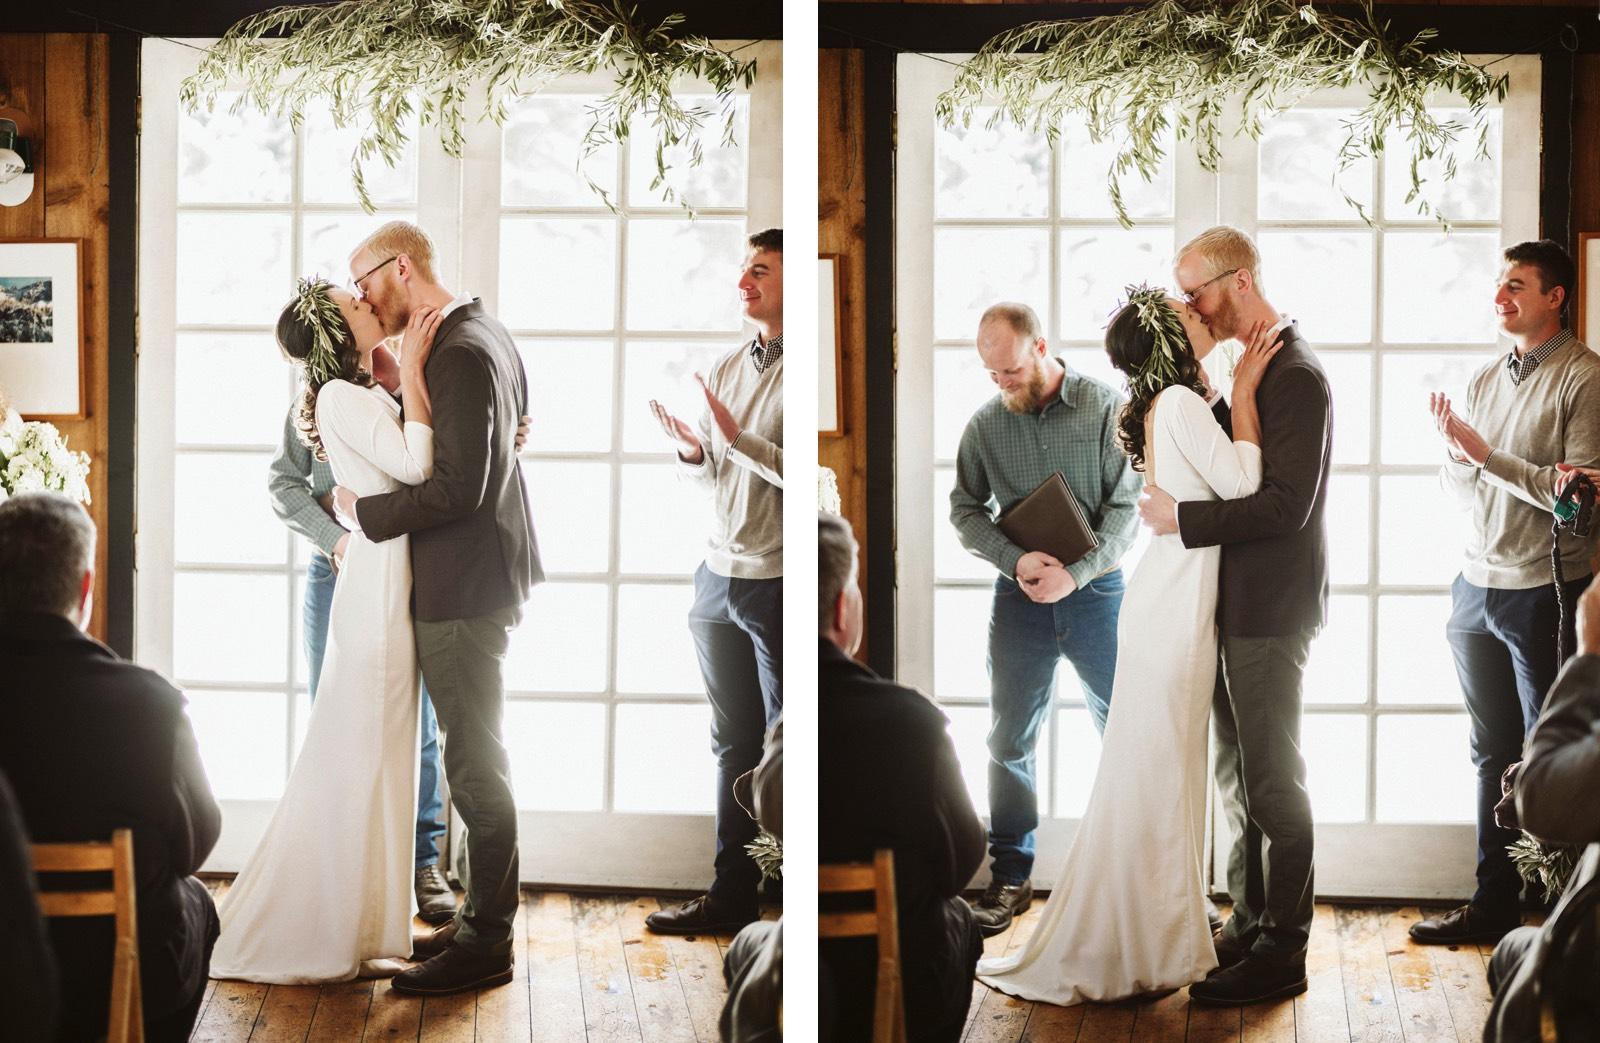 alpine-lakes-high-camp-winter-wedding-40 ALPINE LAKES HIGH CAMP WEDDING